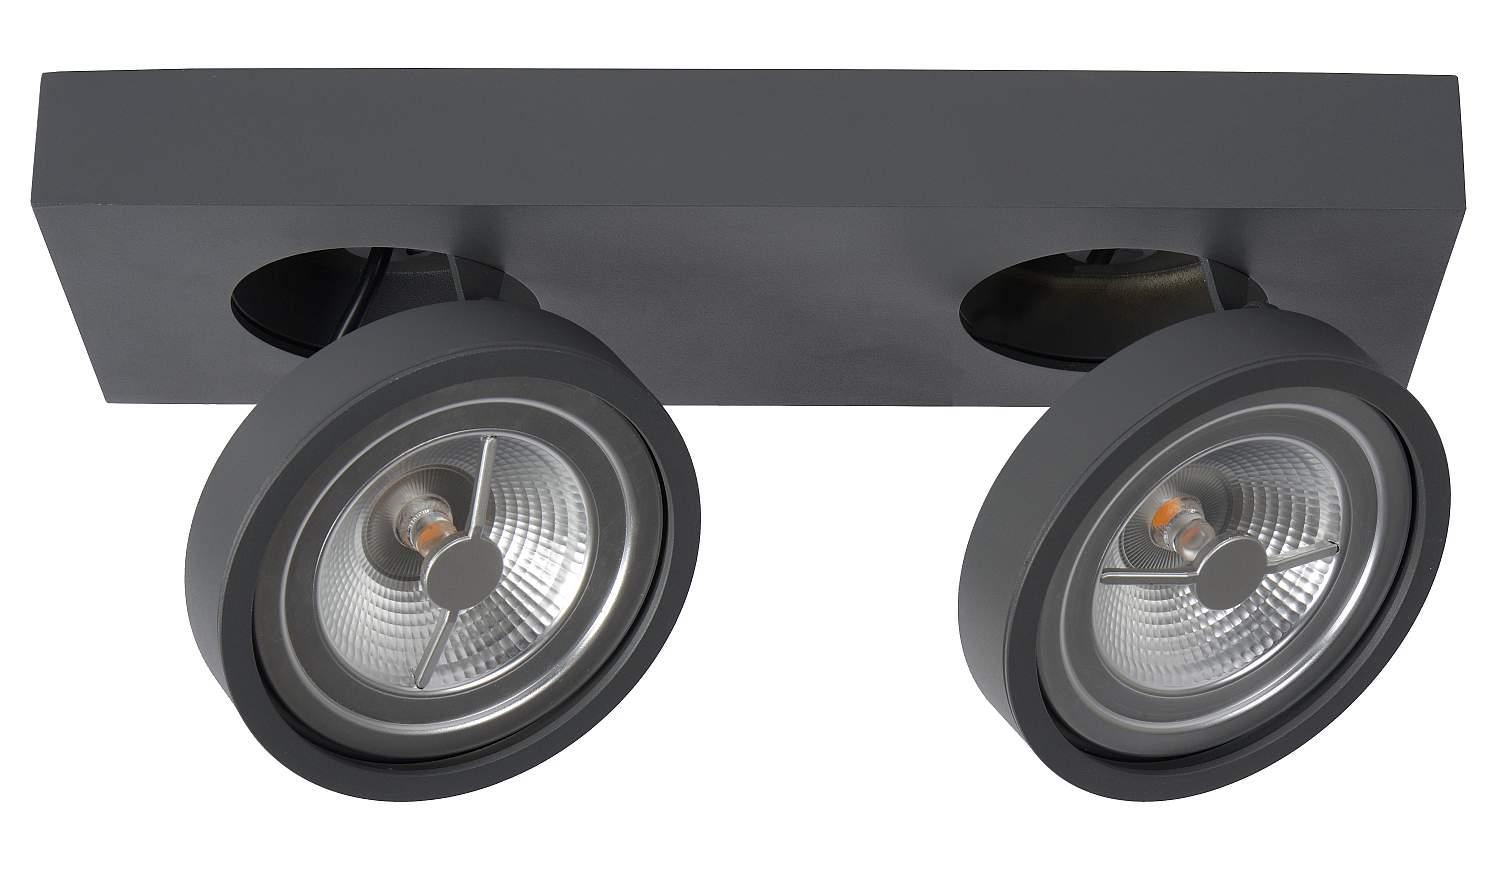 Lucide NENAD AR111 - Plafondspot LED Dimbaar - 2x10W 2700K - Grijs